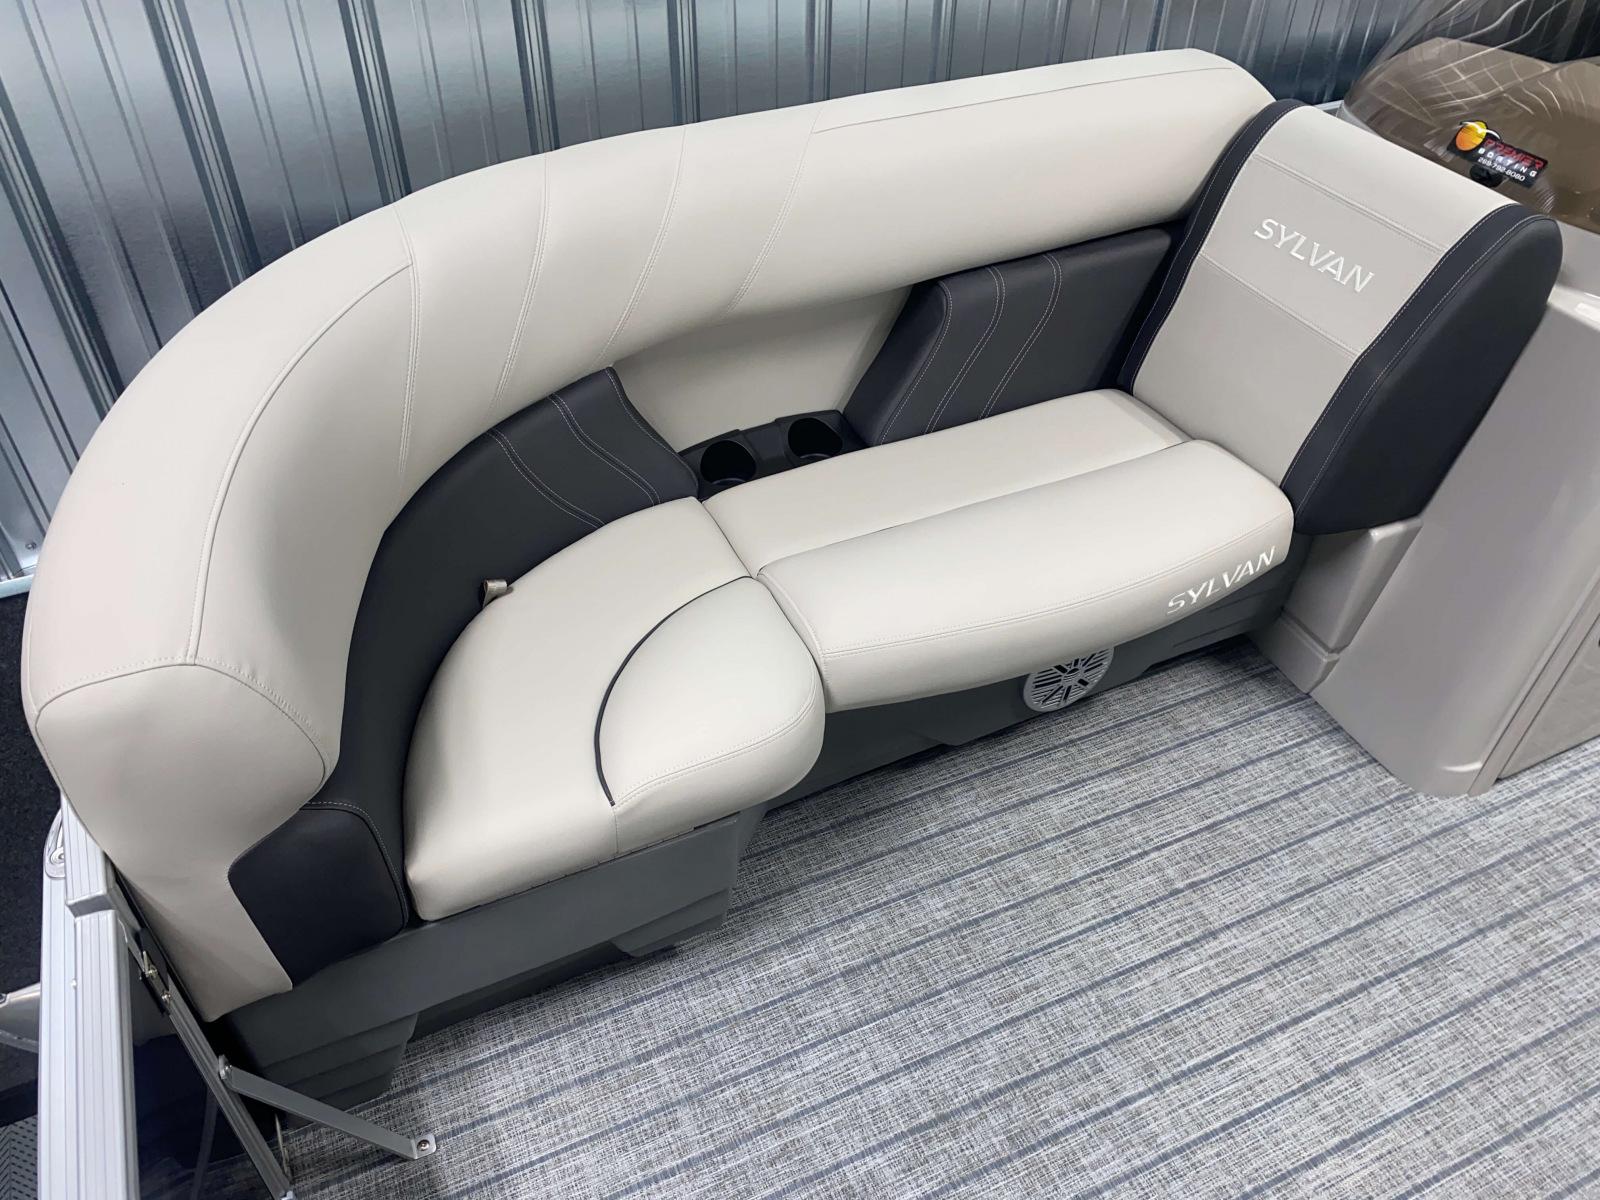 Interior Seating of the 2022 Sylvan Mirage 8520 Cruise Pontoon Boat